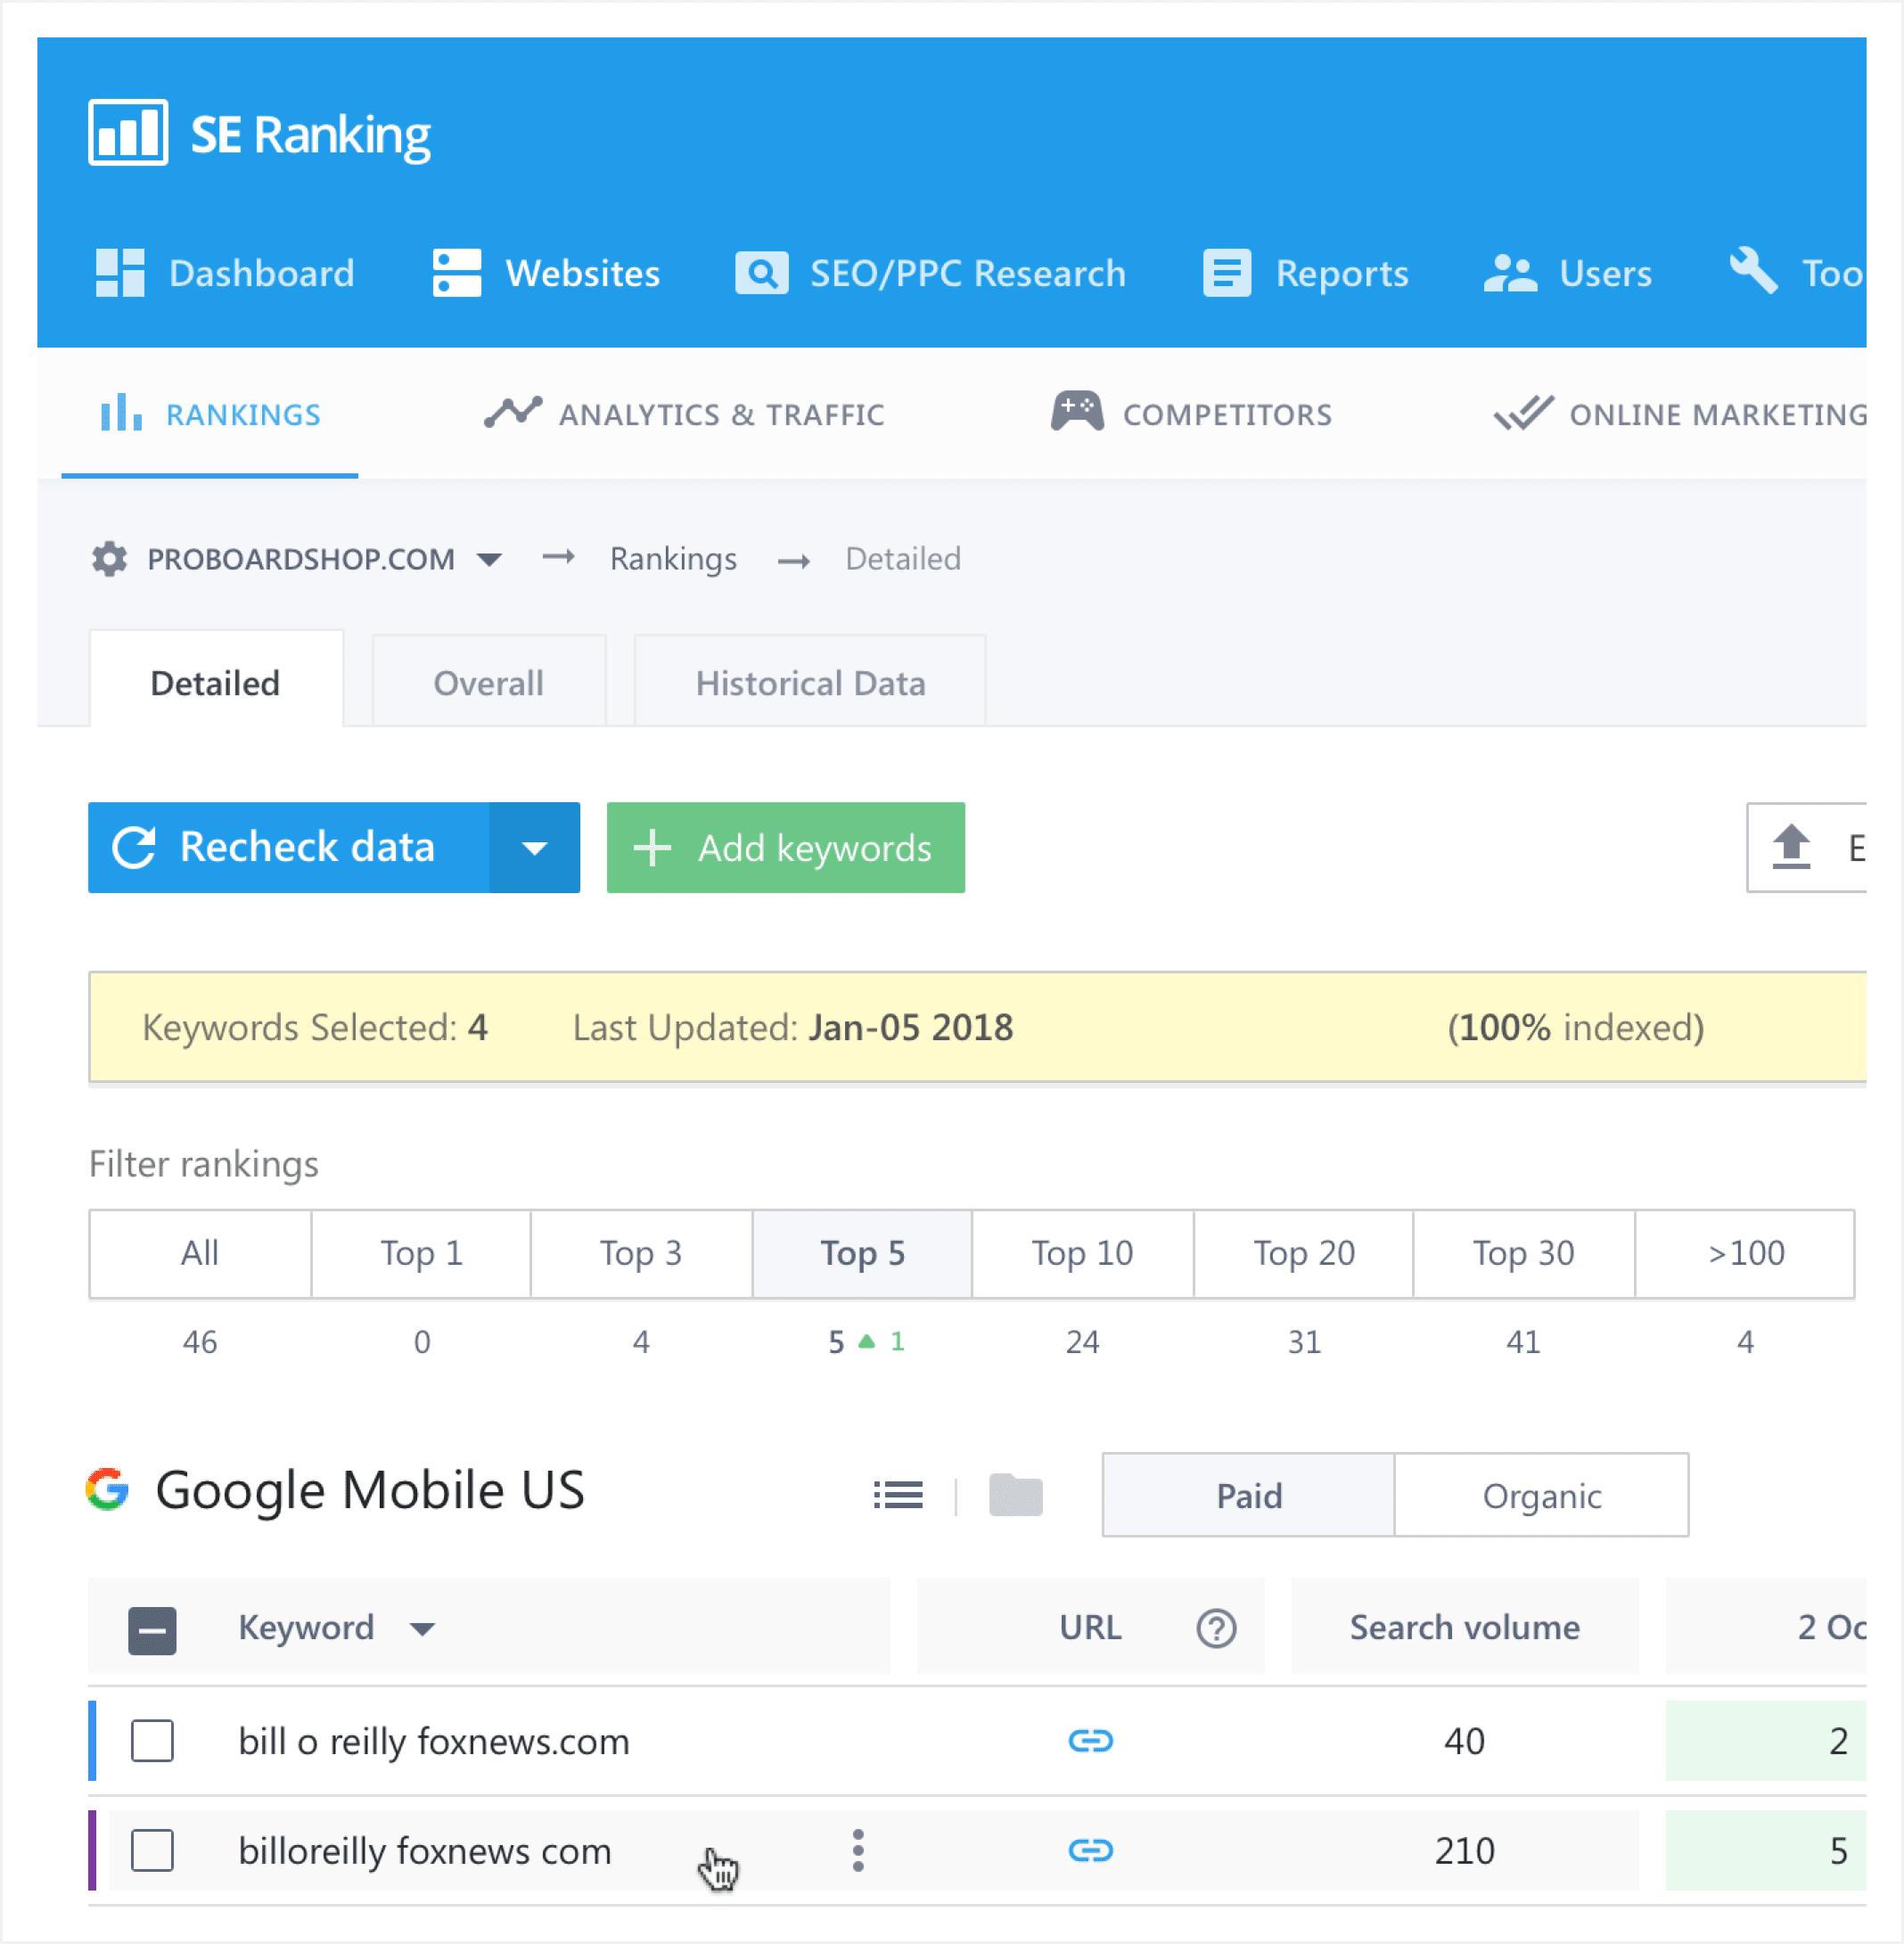 new-interface-se-ranking